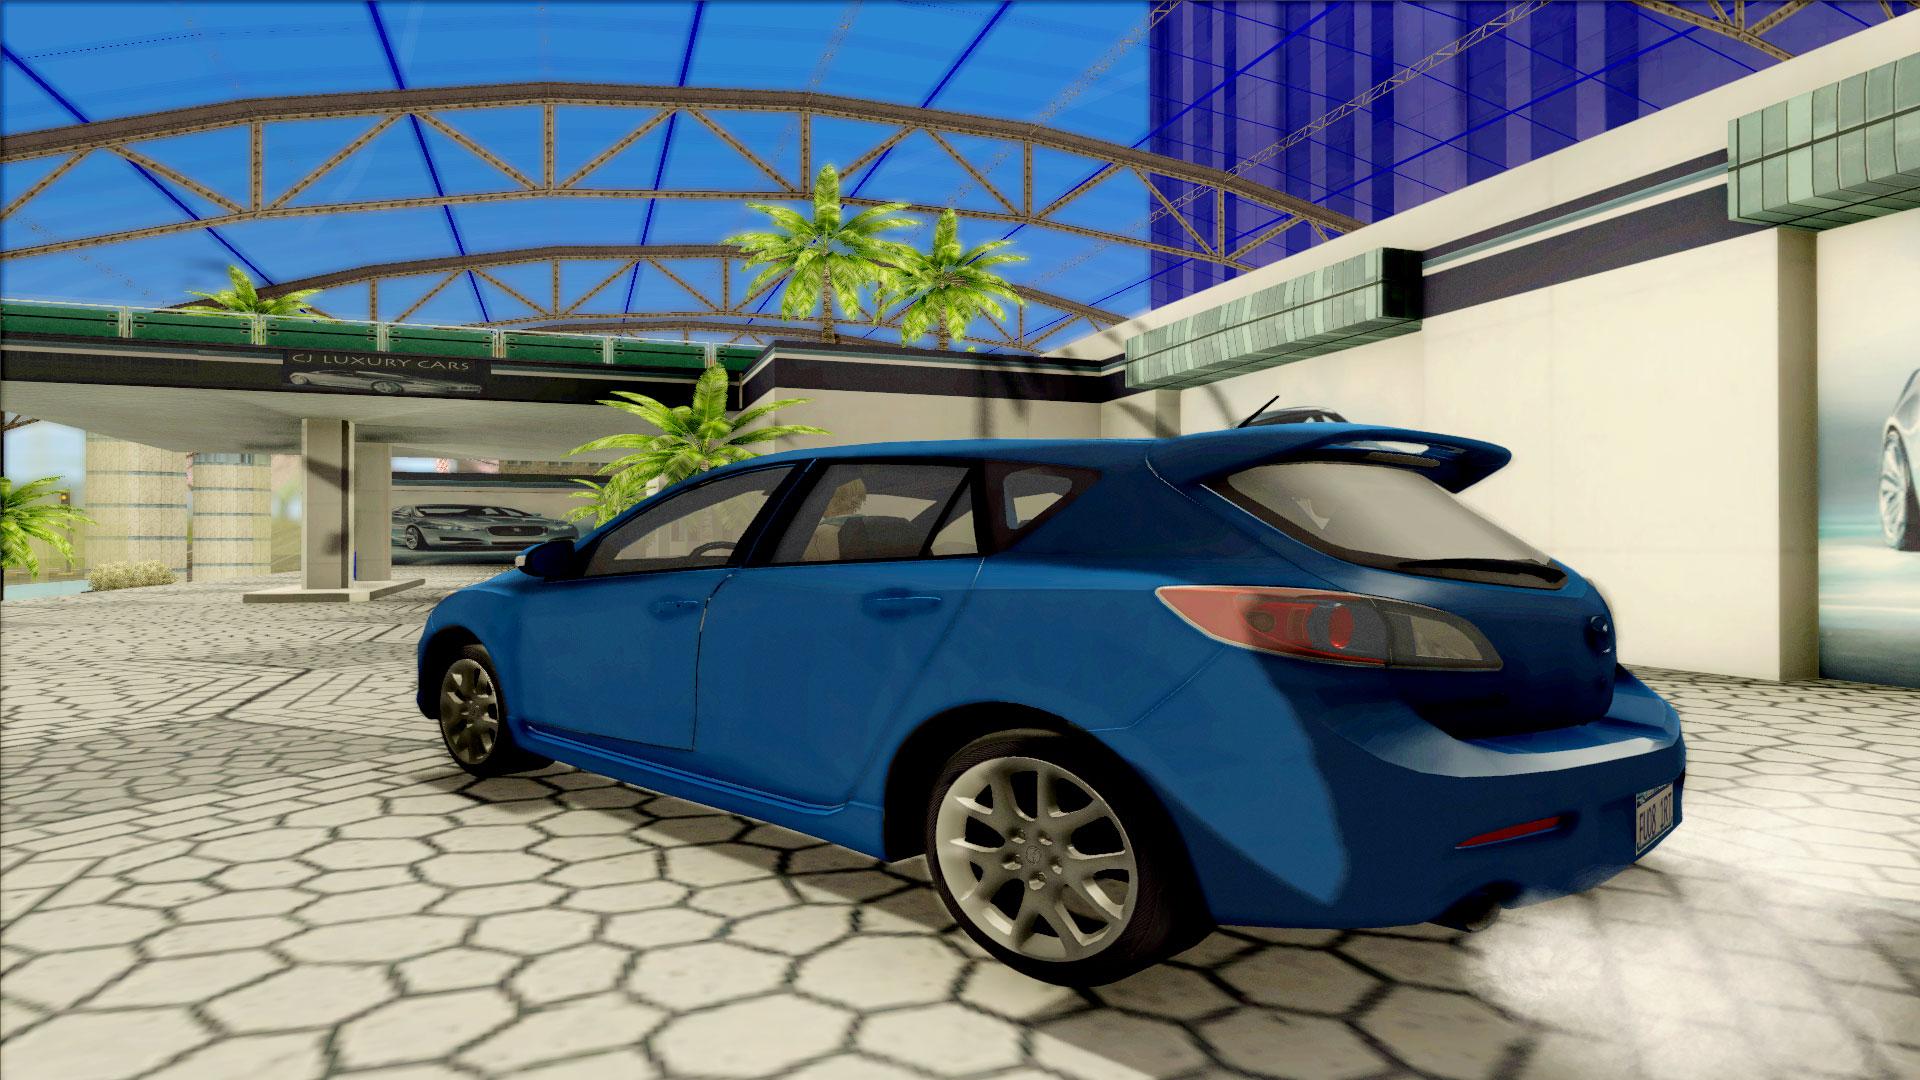 2010 mazda mazdaspeed 3 gtasa collectors mod for Mazdaspeed 6 exterior mods